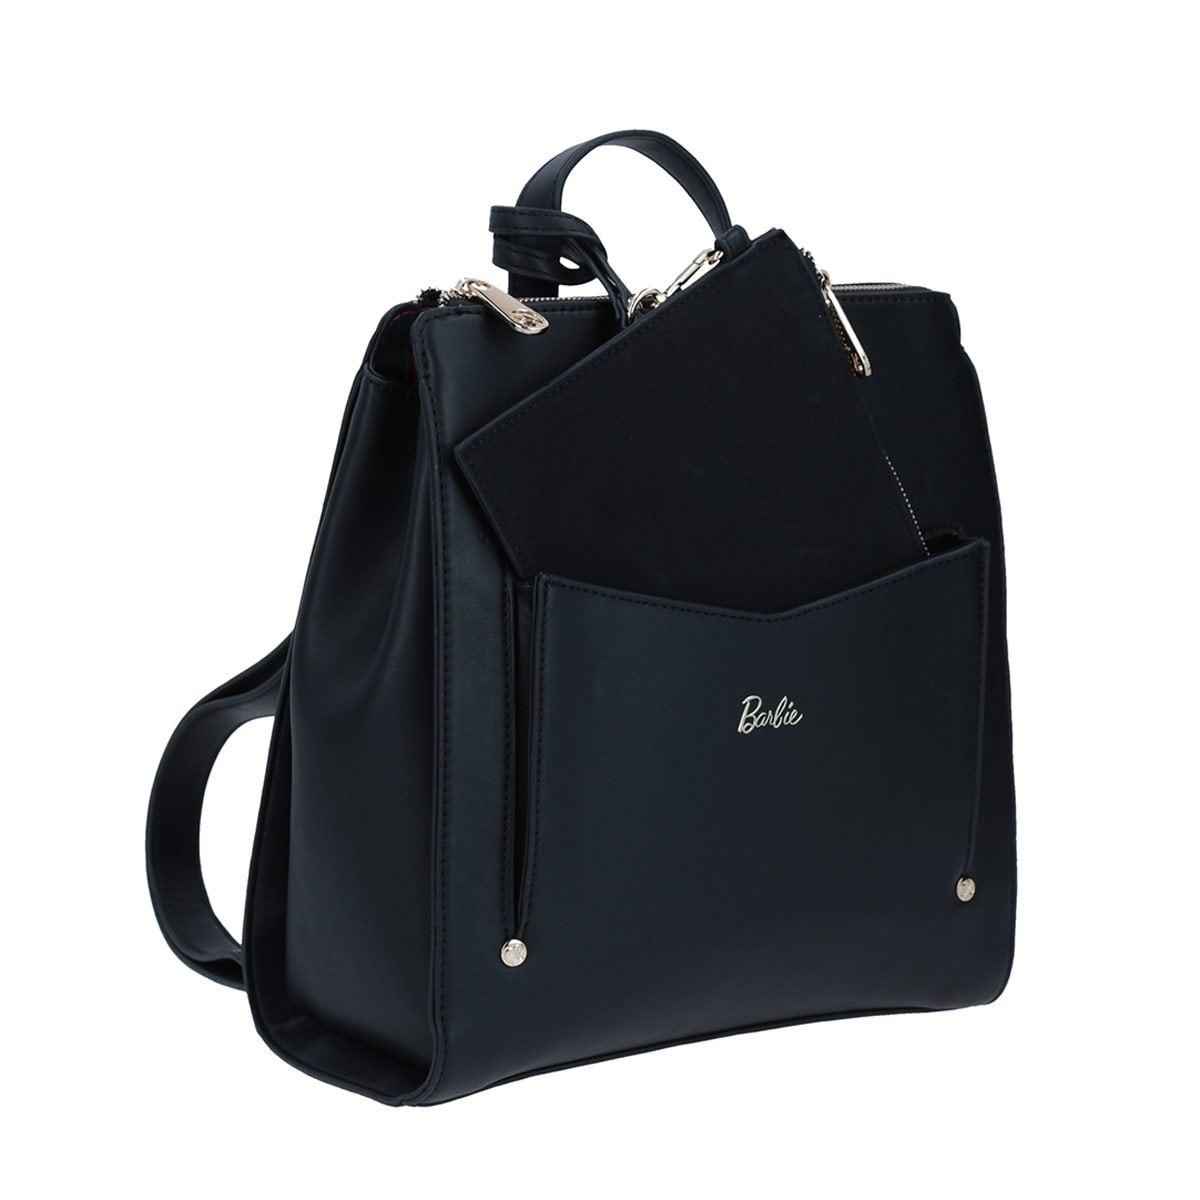 Mochila mediana Barbie X Gorett backpack mediana negro